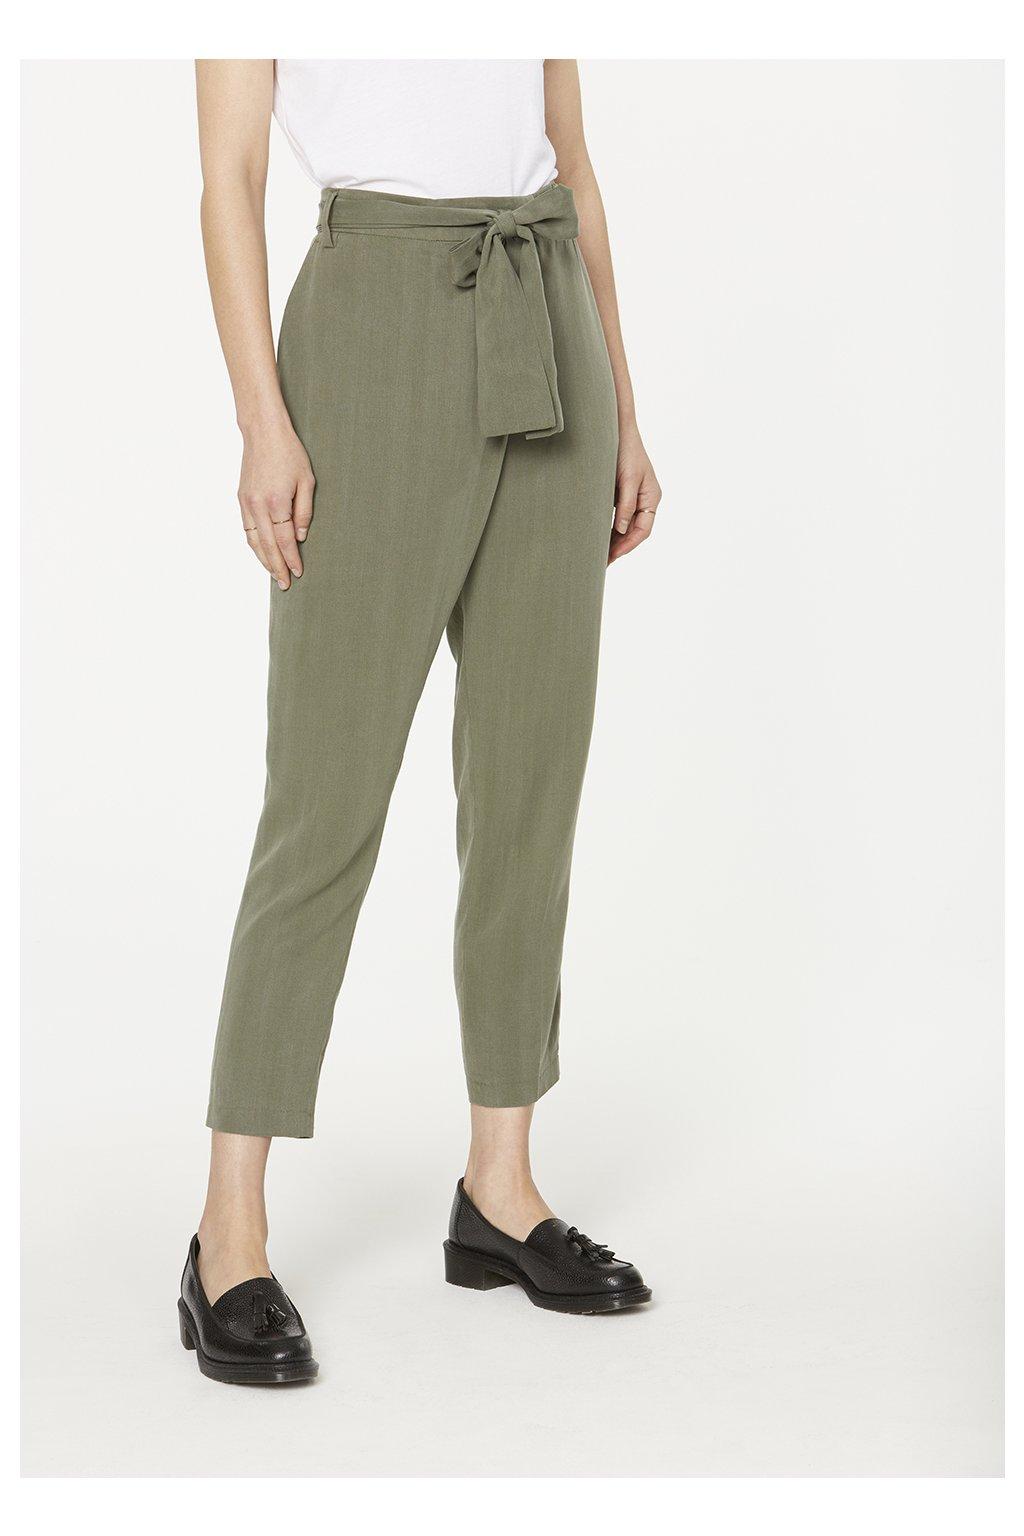 "Dámské zelené kalhoty ""Jolena Khaki"" (Velikost L)"